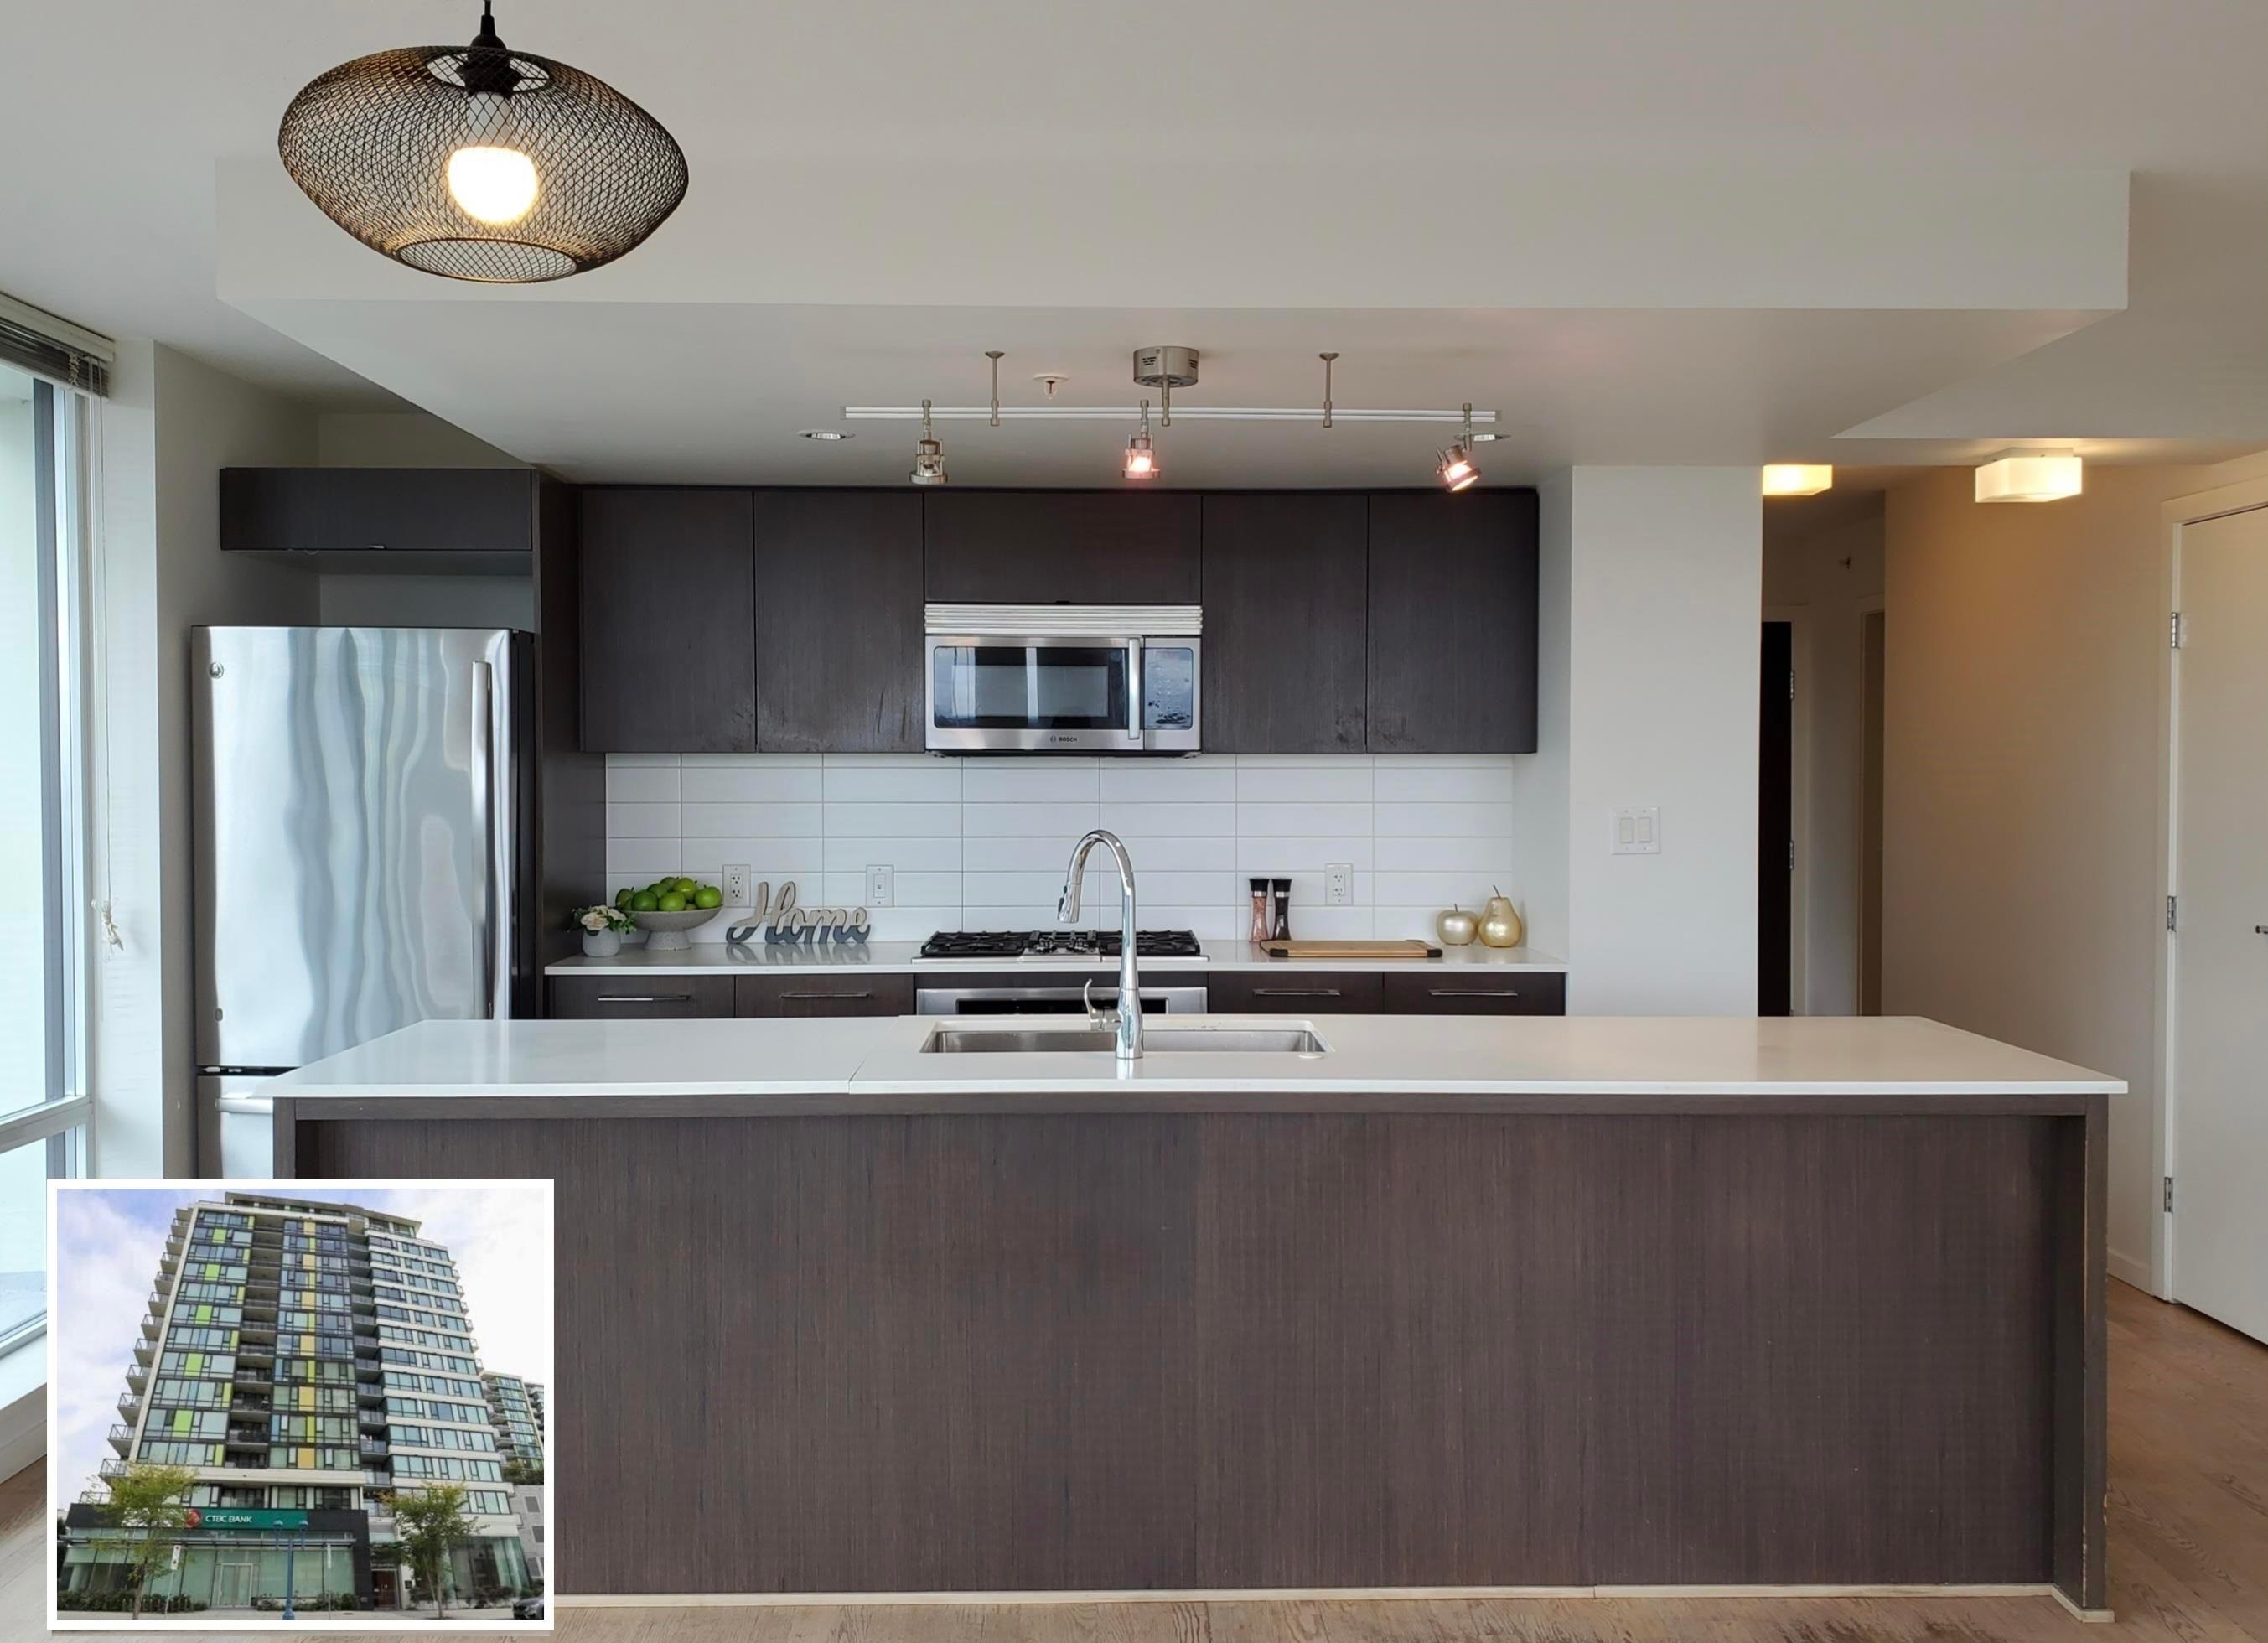 1113 7988 ACKROYD ROAD - Granville Apartment/Condo for sale, 2 Bedrooms (R2622591)